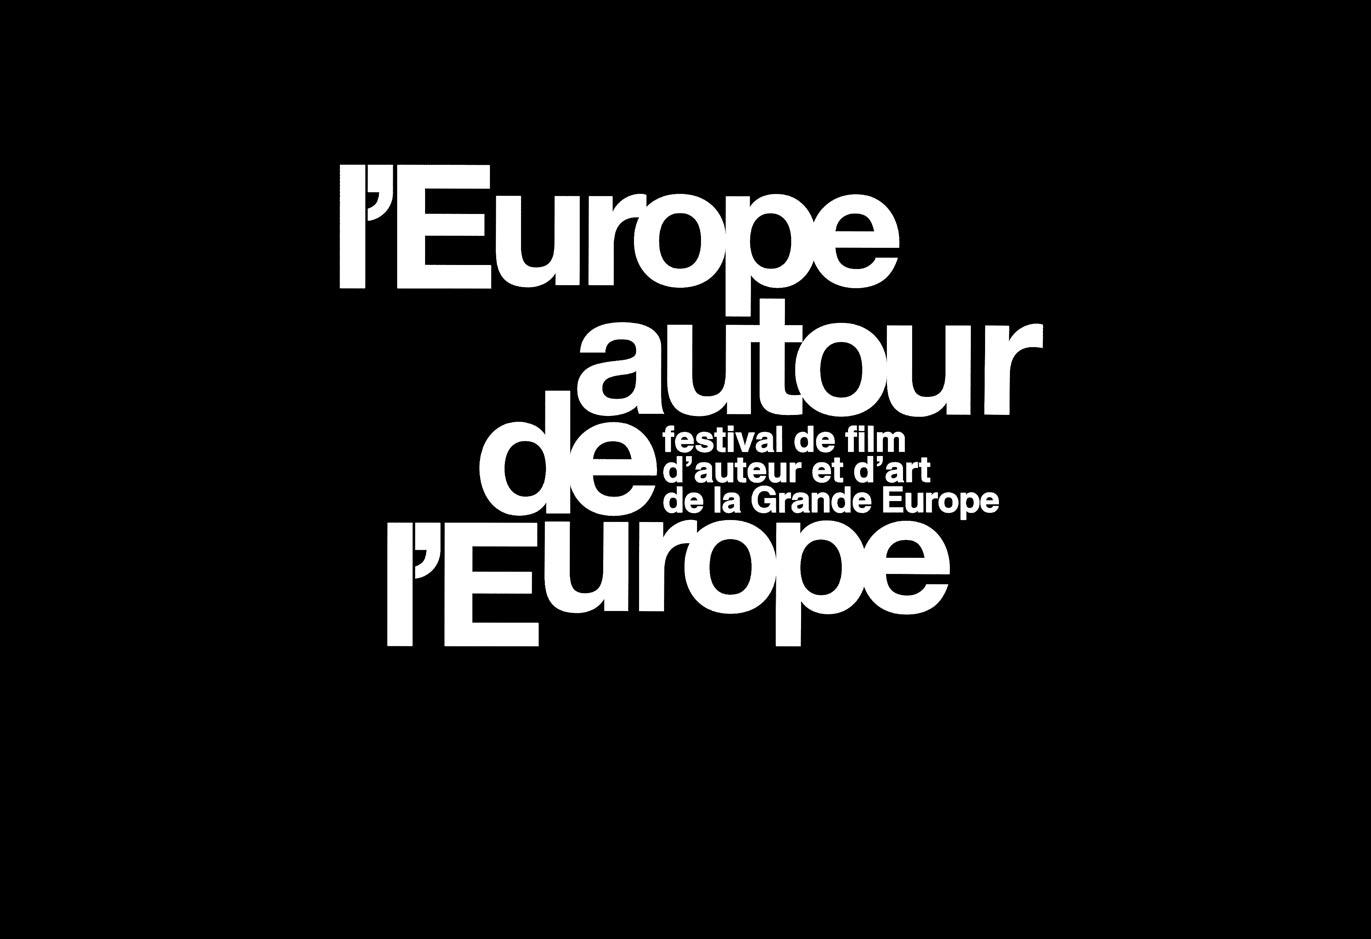 CANCELED. TO BE RESCHEDULED. L'Europe autour de l'Europe Film Festival